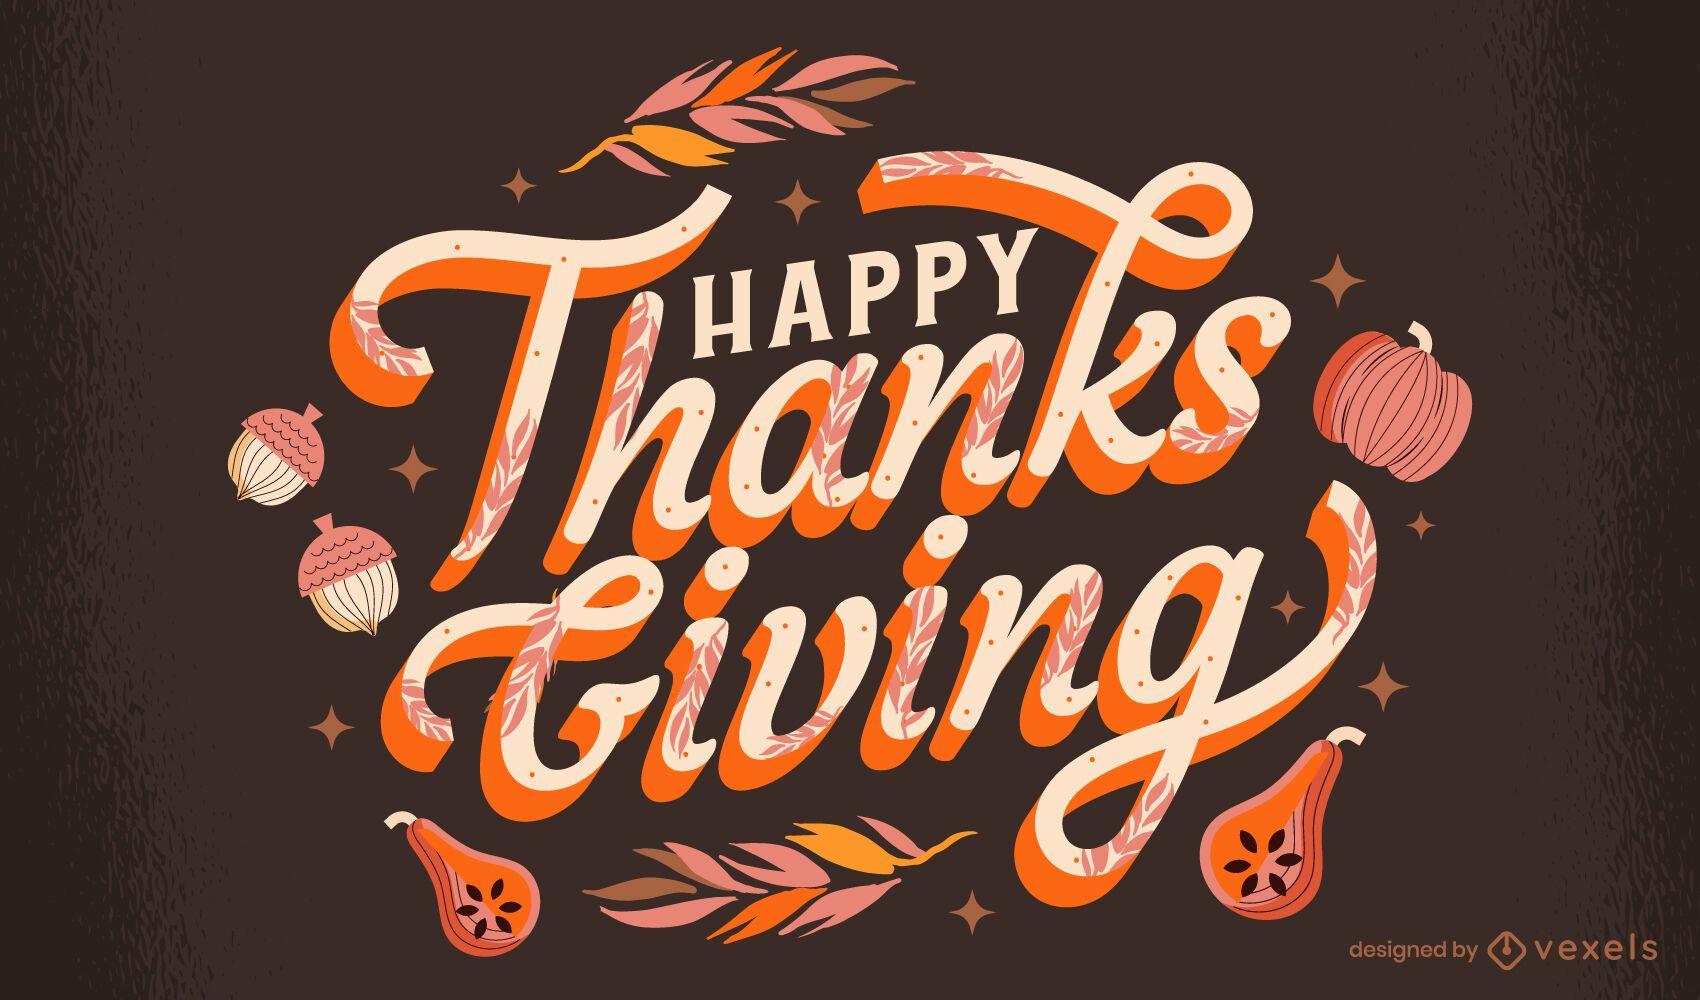 Happy thanksgiving lettering design